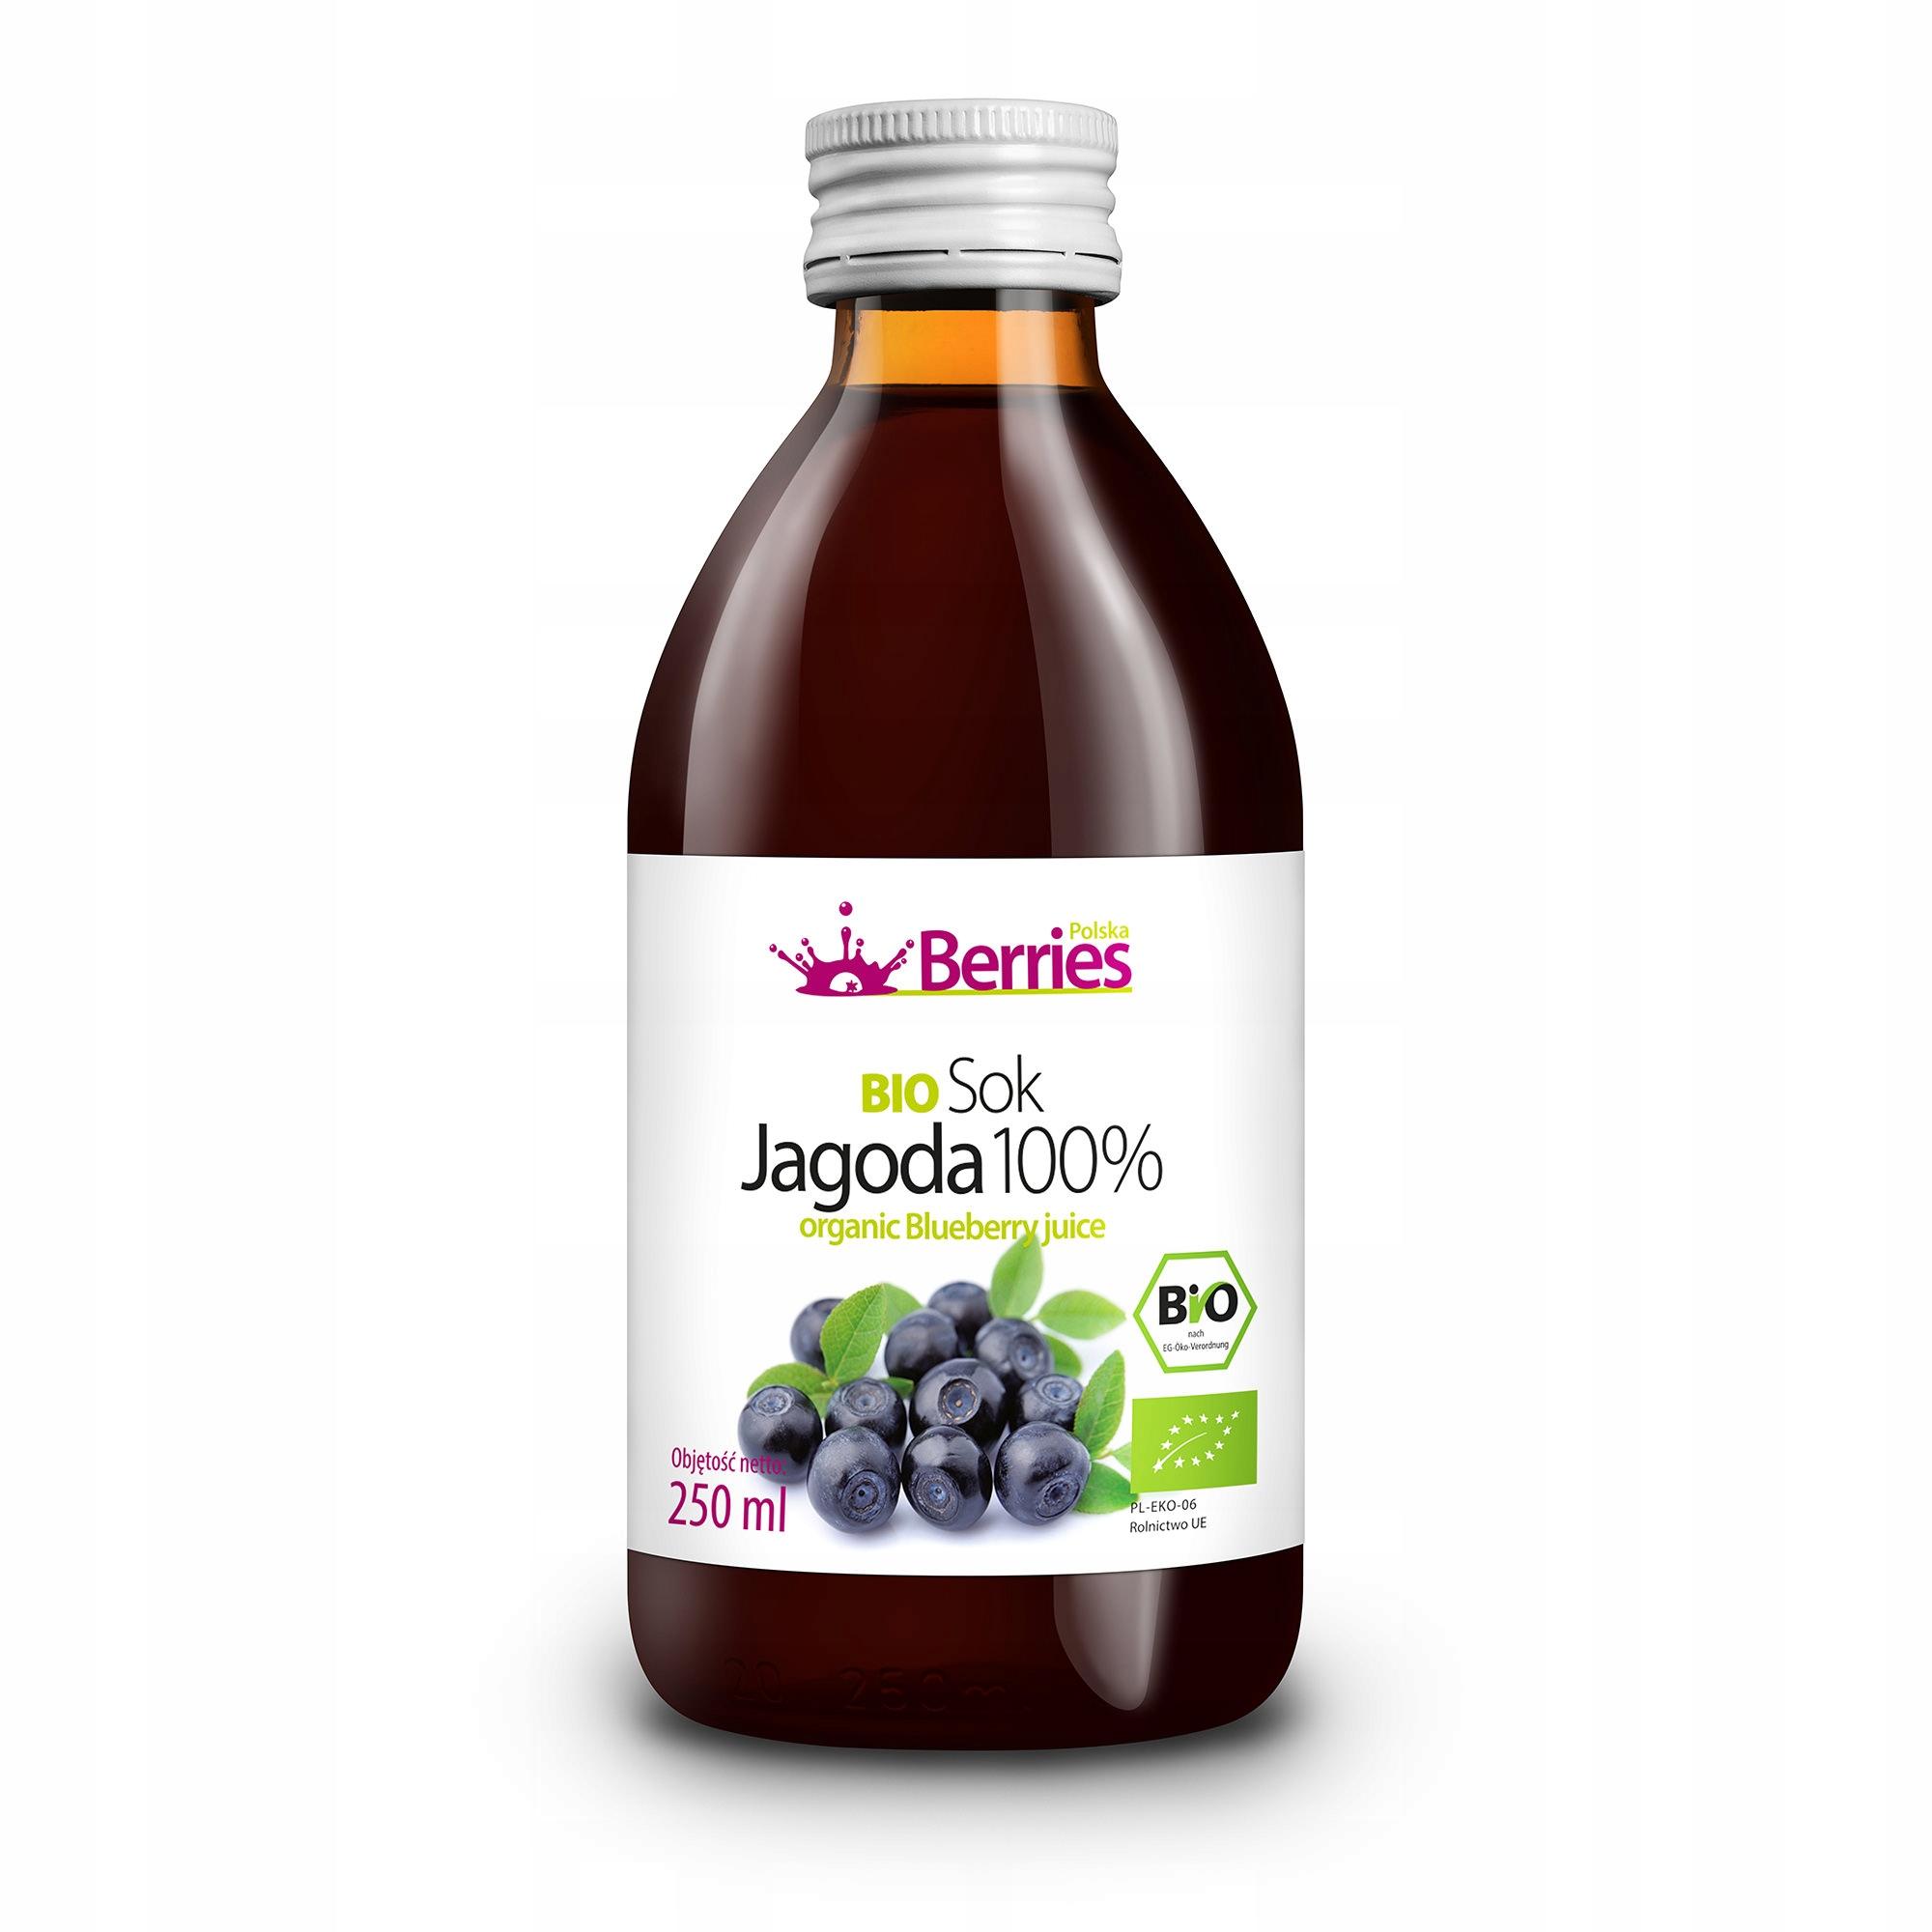 Sok BIO Jagoda 100% ekologiczny sok z jagód 250ml